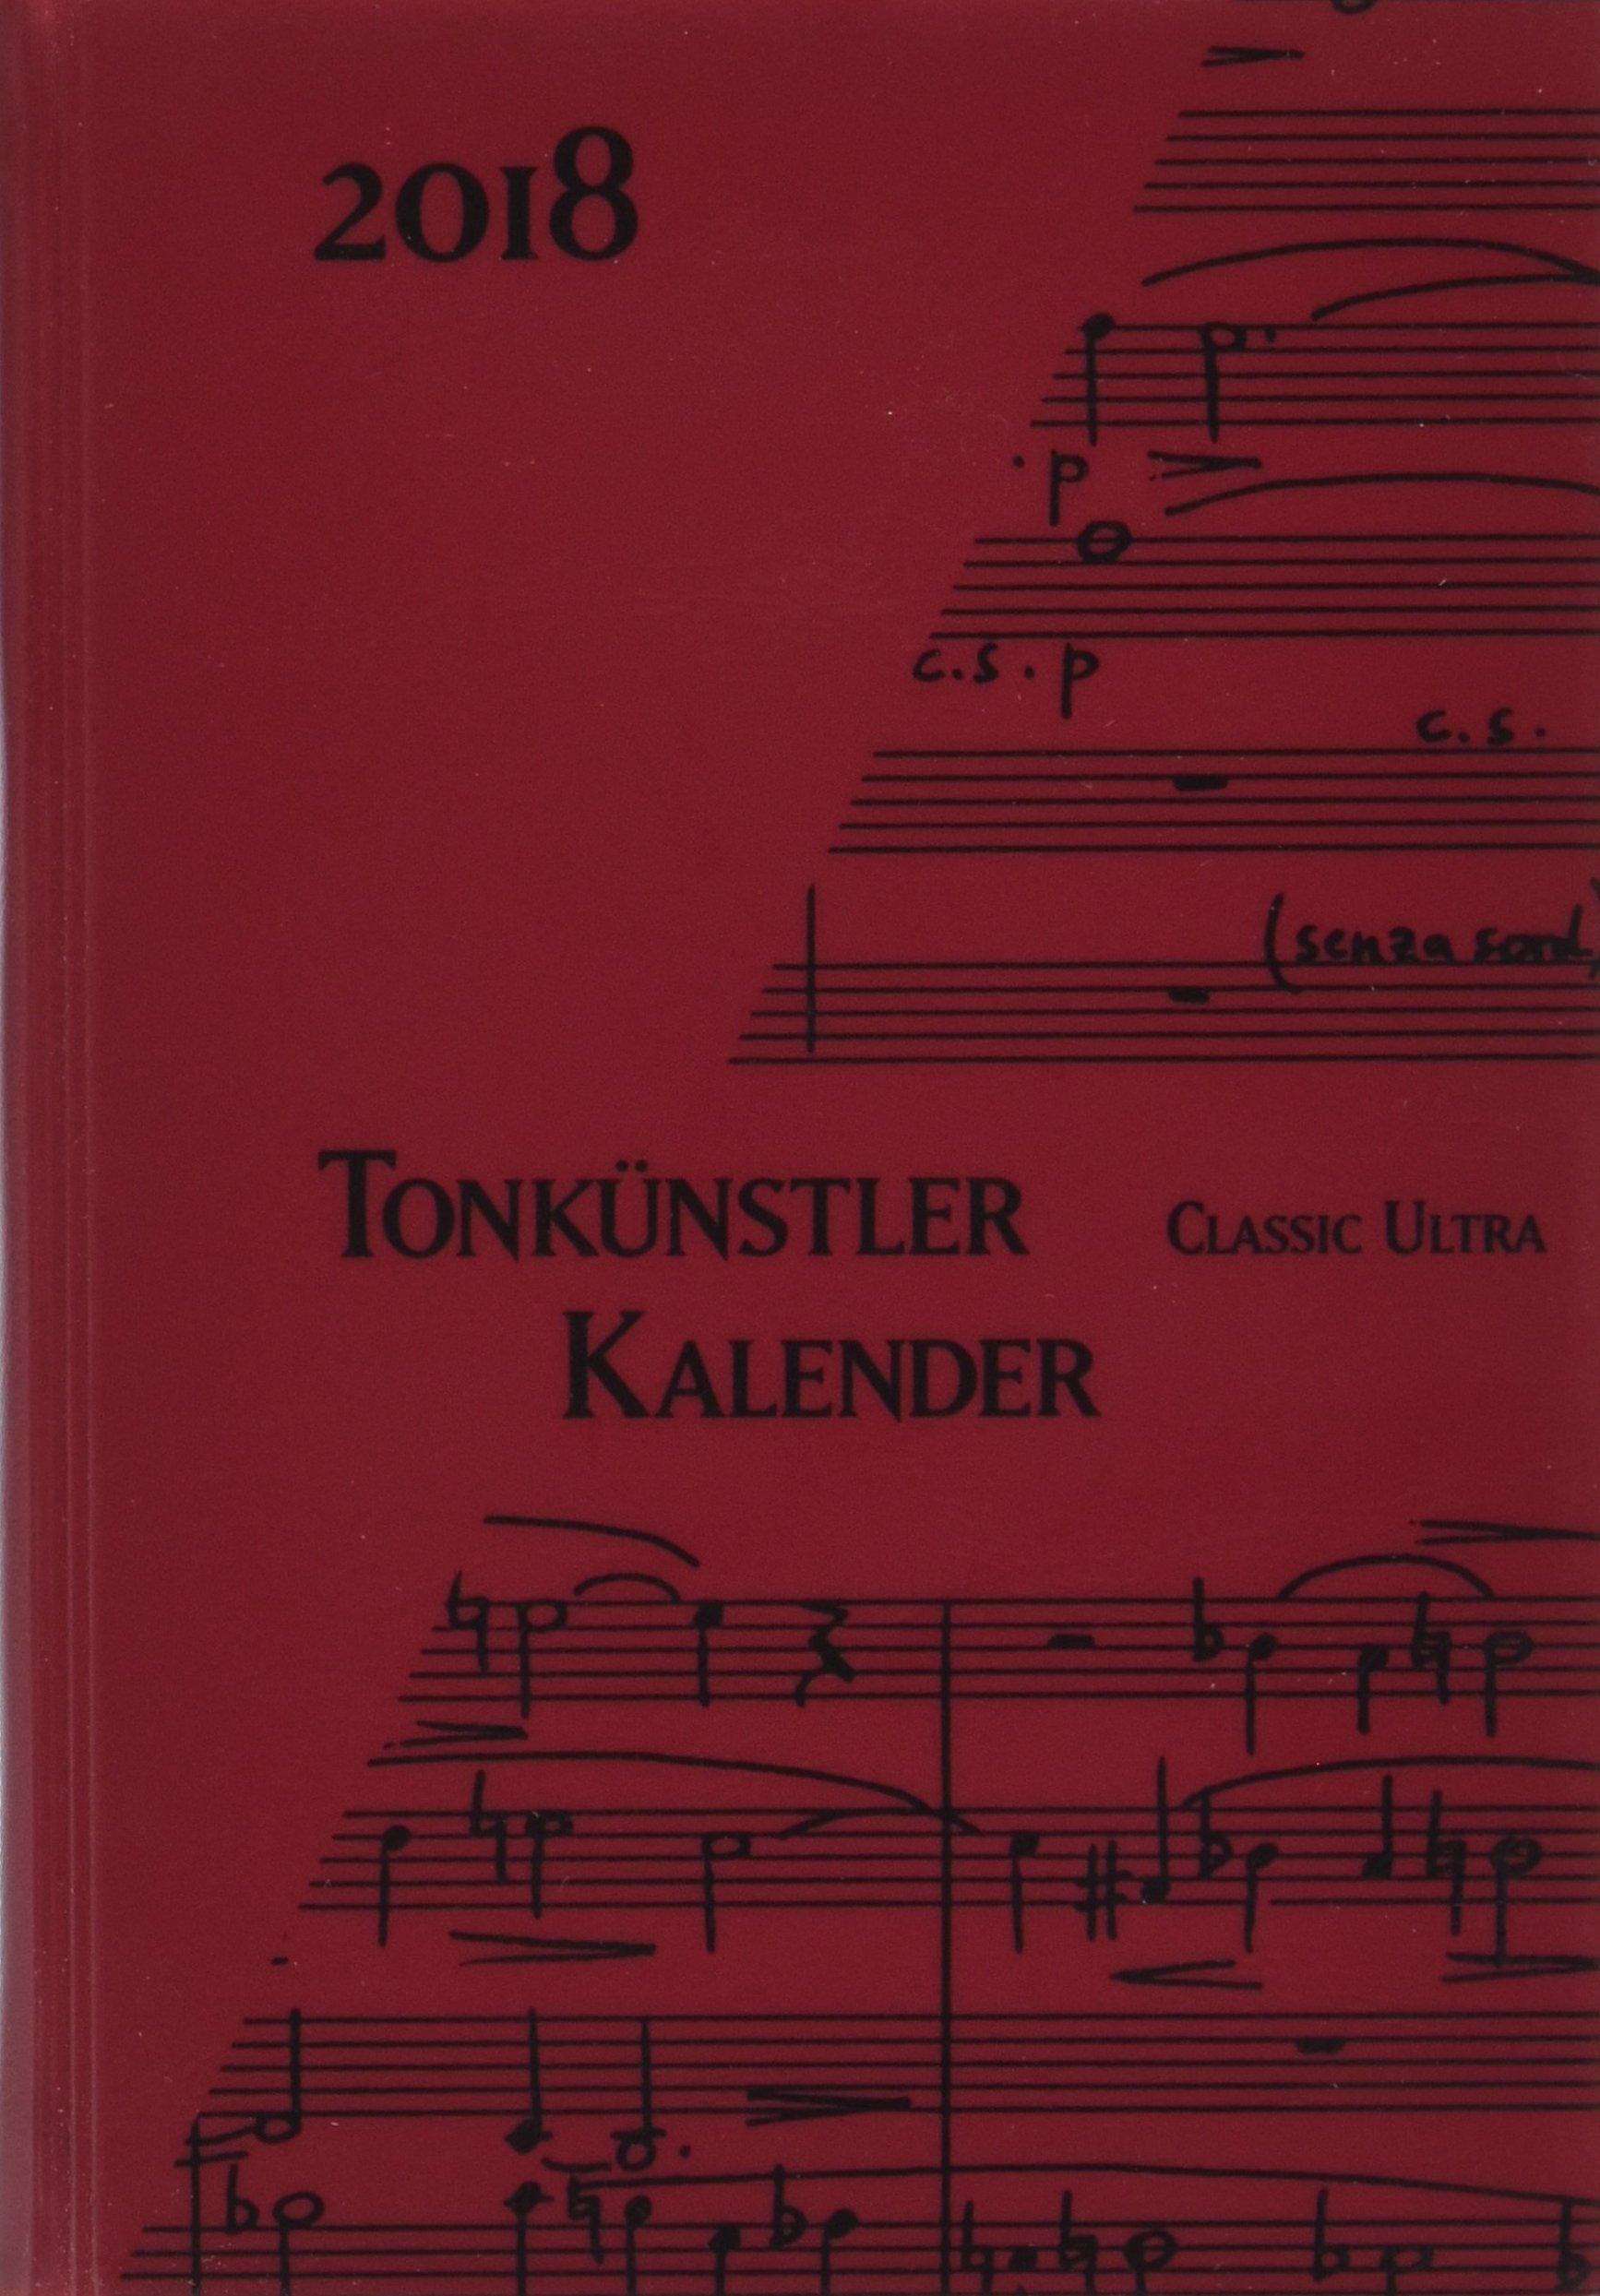 Tonkünstler-Kalender Classic ultra 2018: herausgegeben in Verbindung mit dem Deutschen Tonkünstler-Verband e. V. (DTKV)